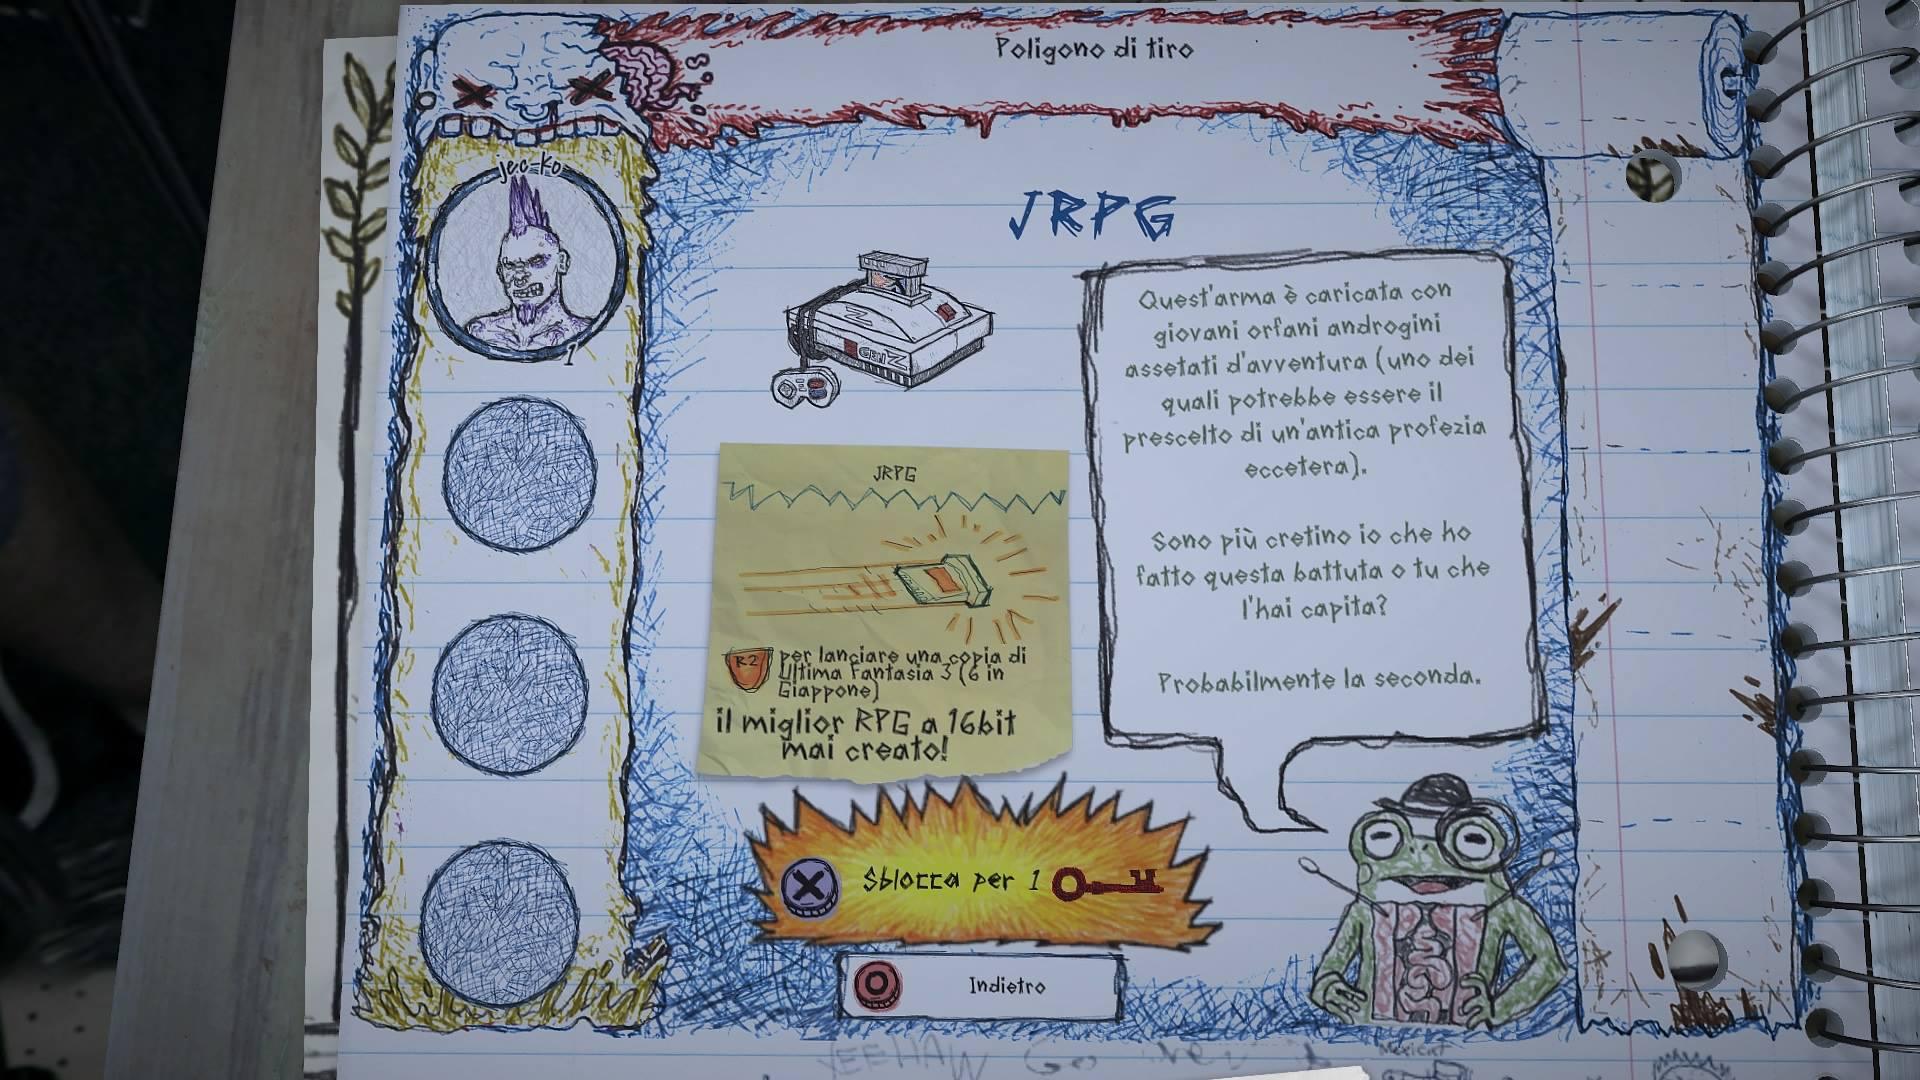 drawn to death jrpg